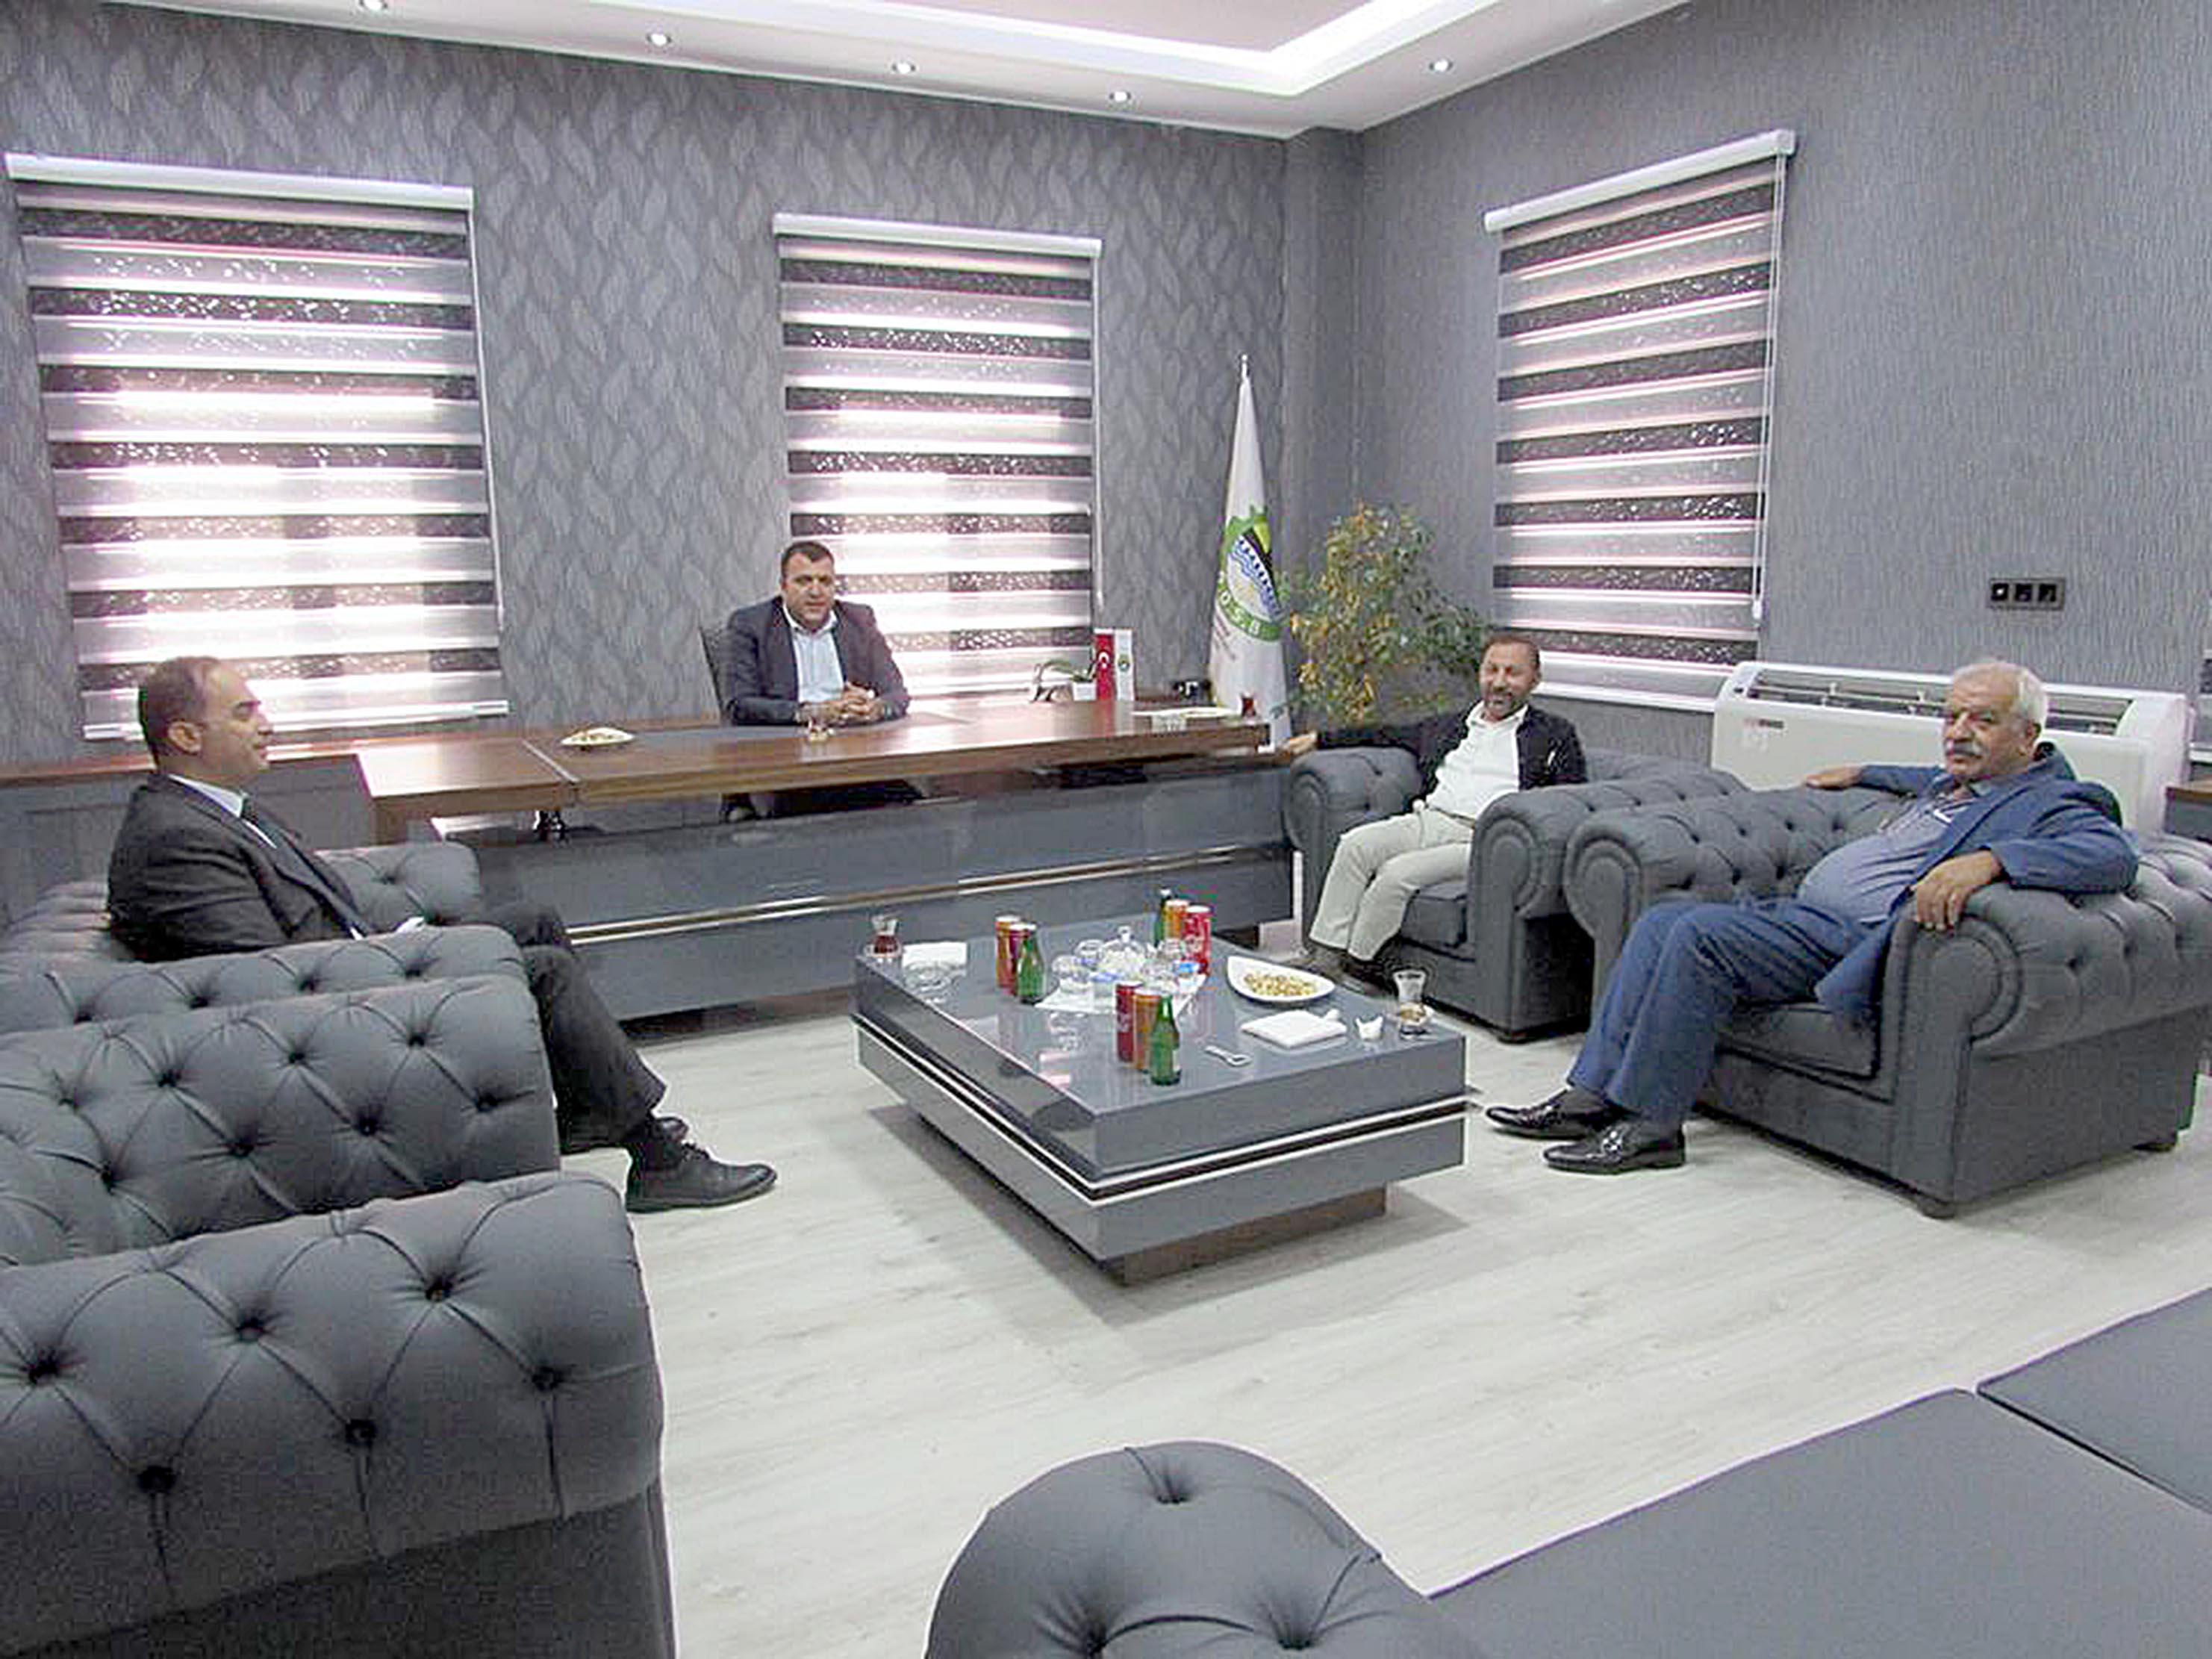 Dev lojistik firmasından Diyarbakır'a yatırım!